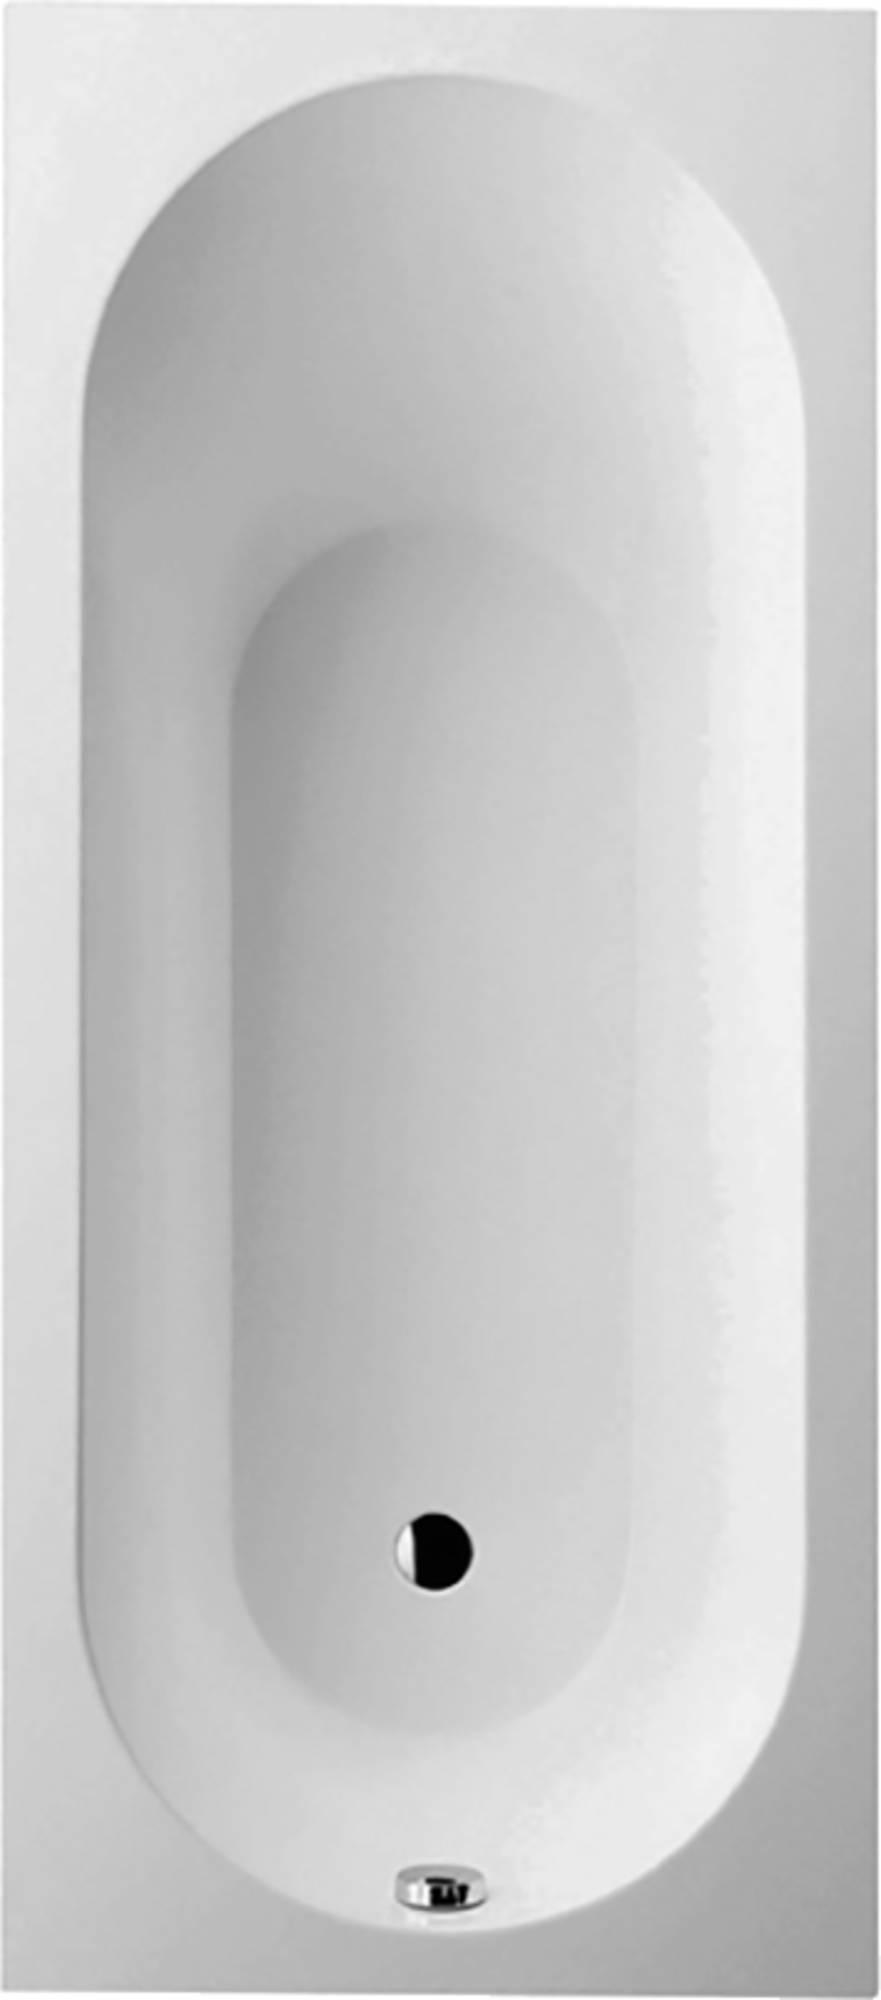 Villeroy&Boch Oberon Bad Acryl 75x160 cm Alpin wit